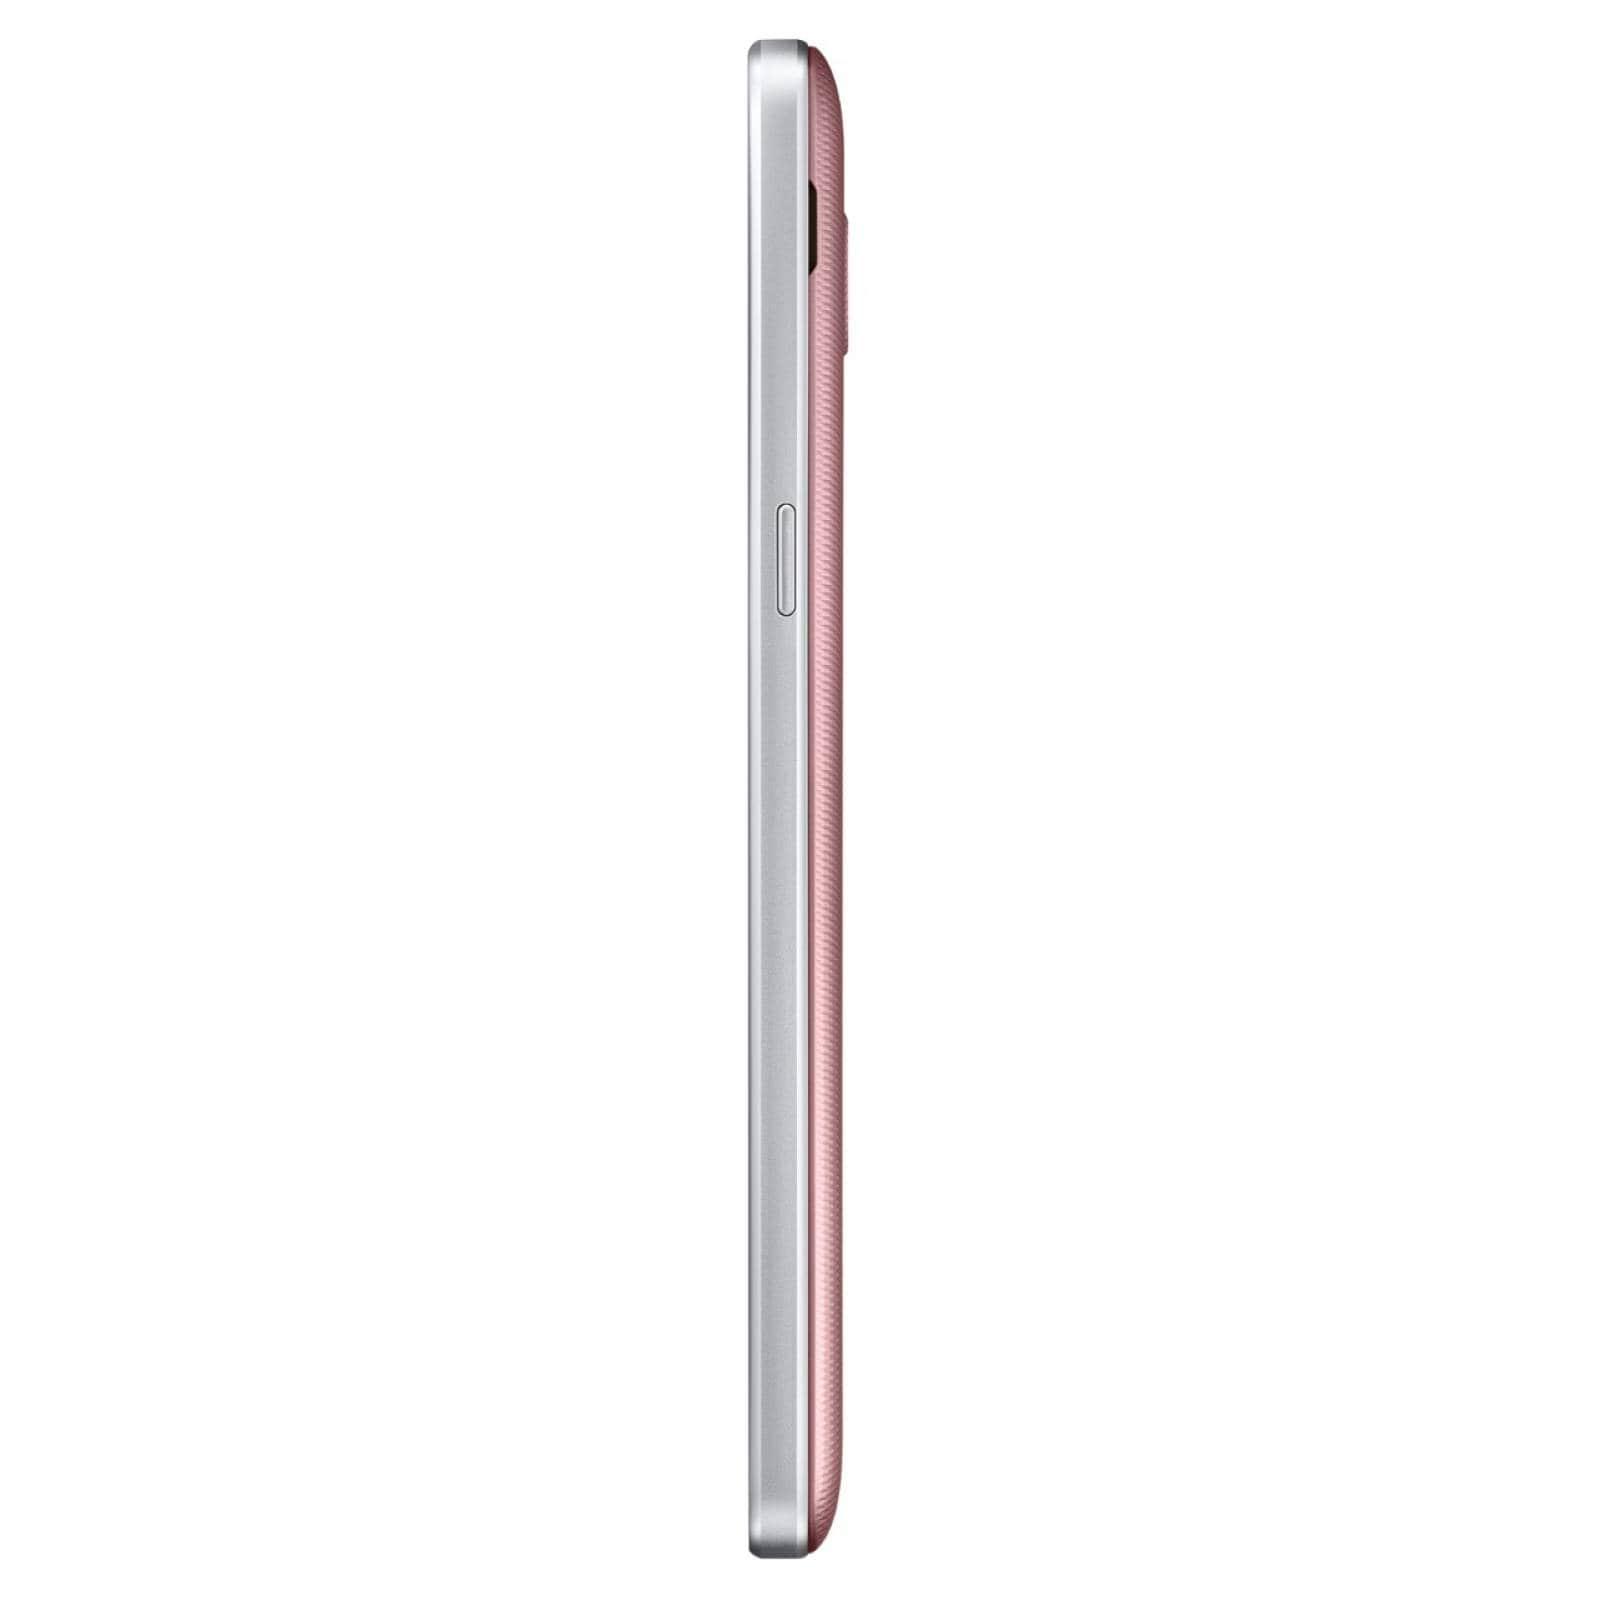 Celular LTE 16GB GALAXY GRAND PRIME + Color Rosa (Telcel)